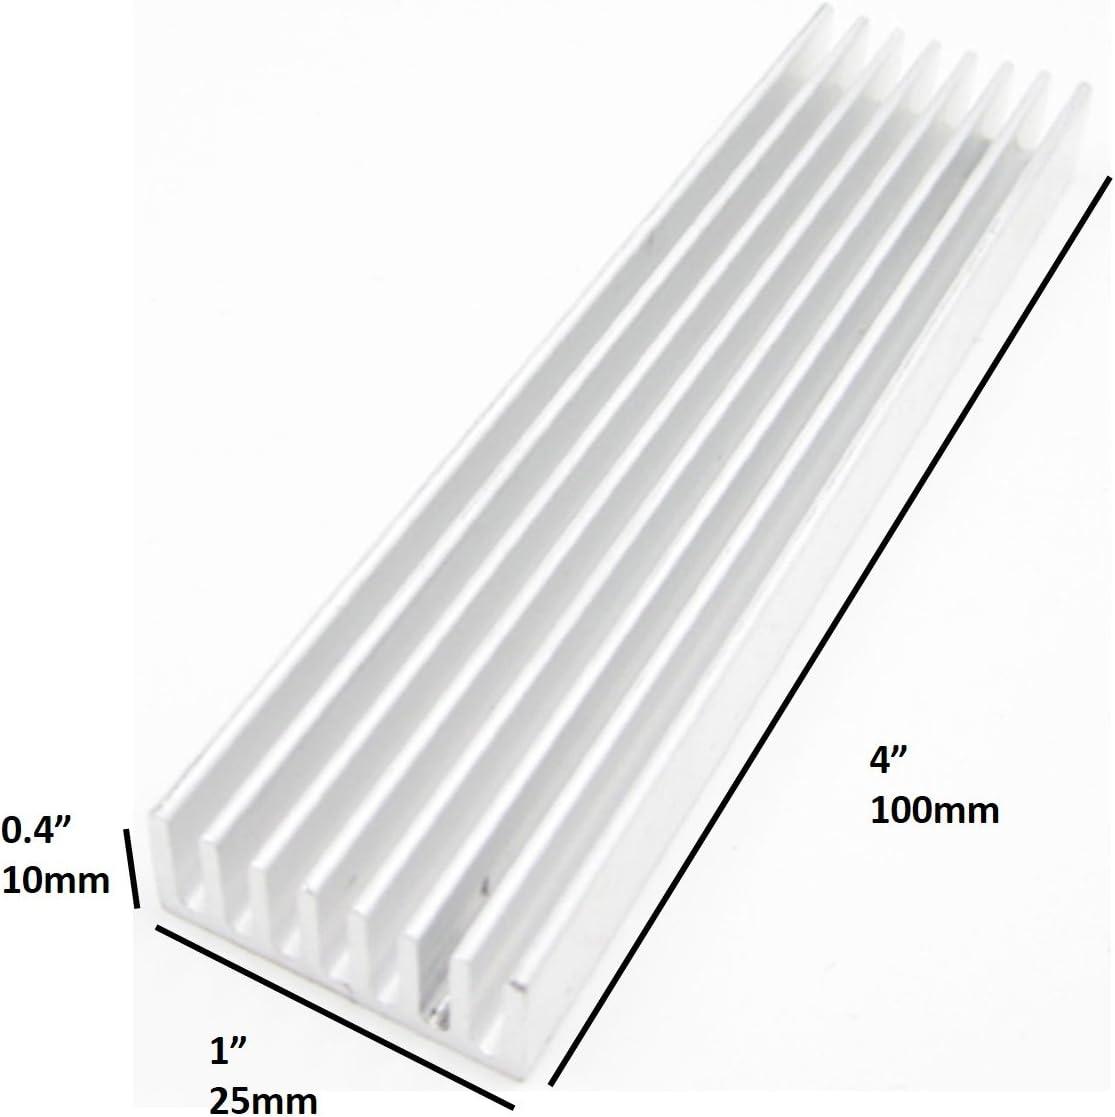 6pcs 50*25*10mm Silver Aluminum Heat Sink